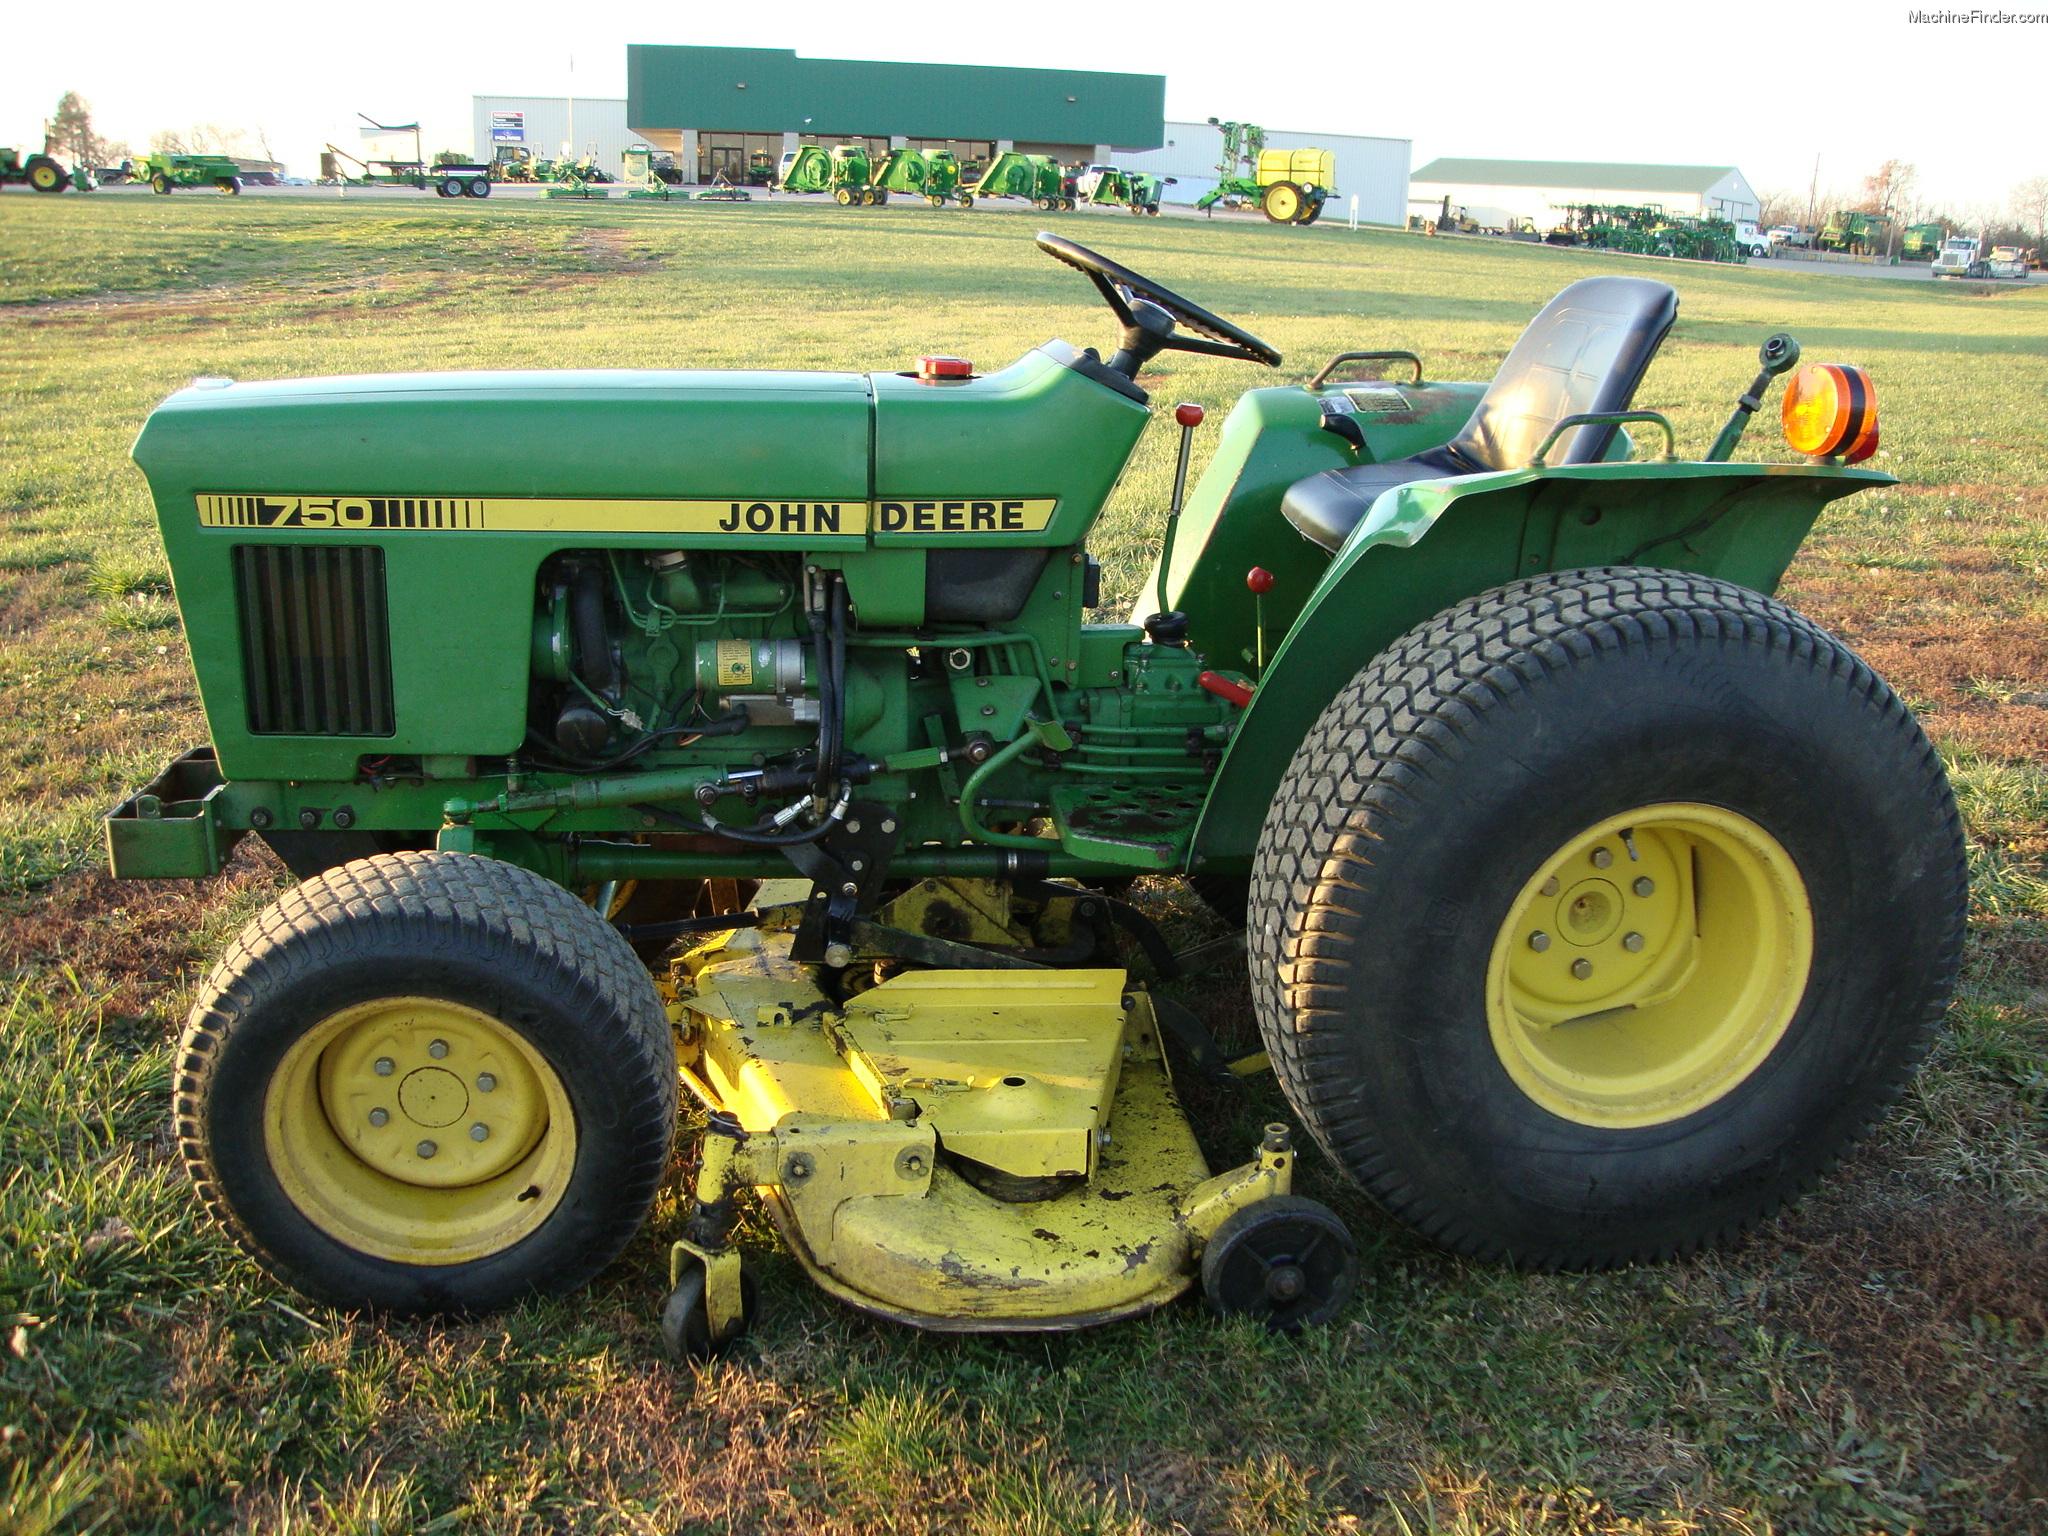 1983 John Deere 750 Tractors - Compact (1-40hp.) - John ...